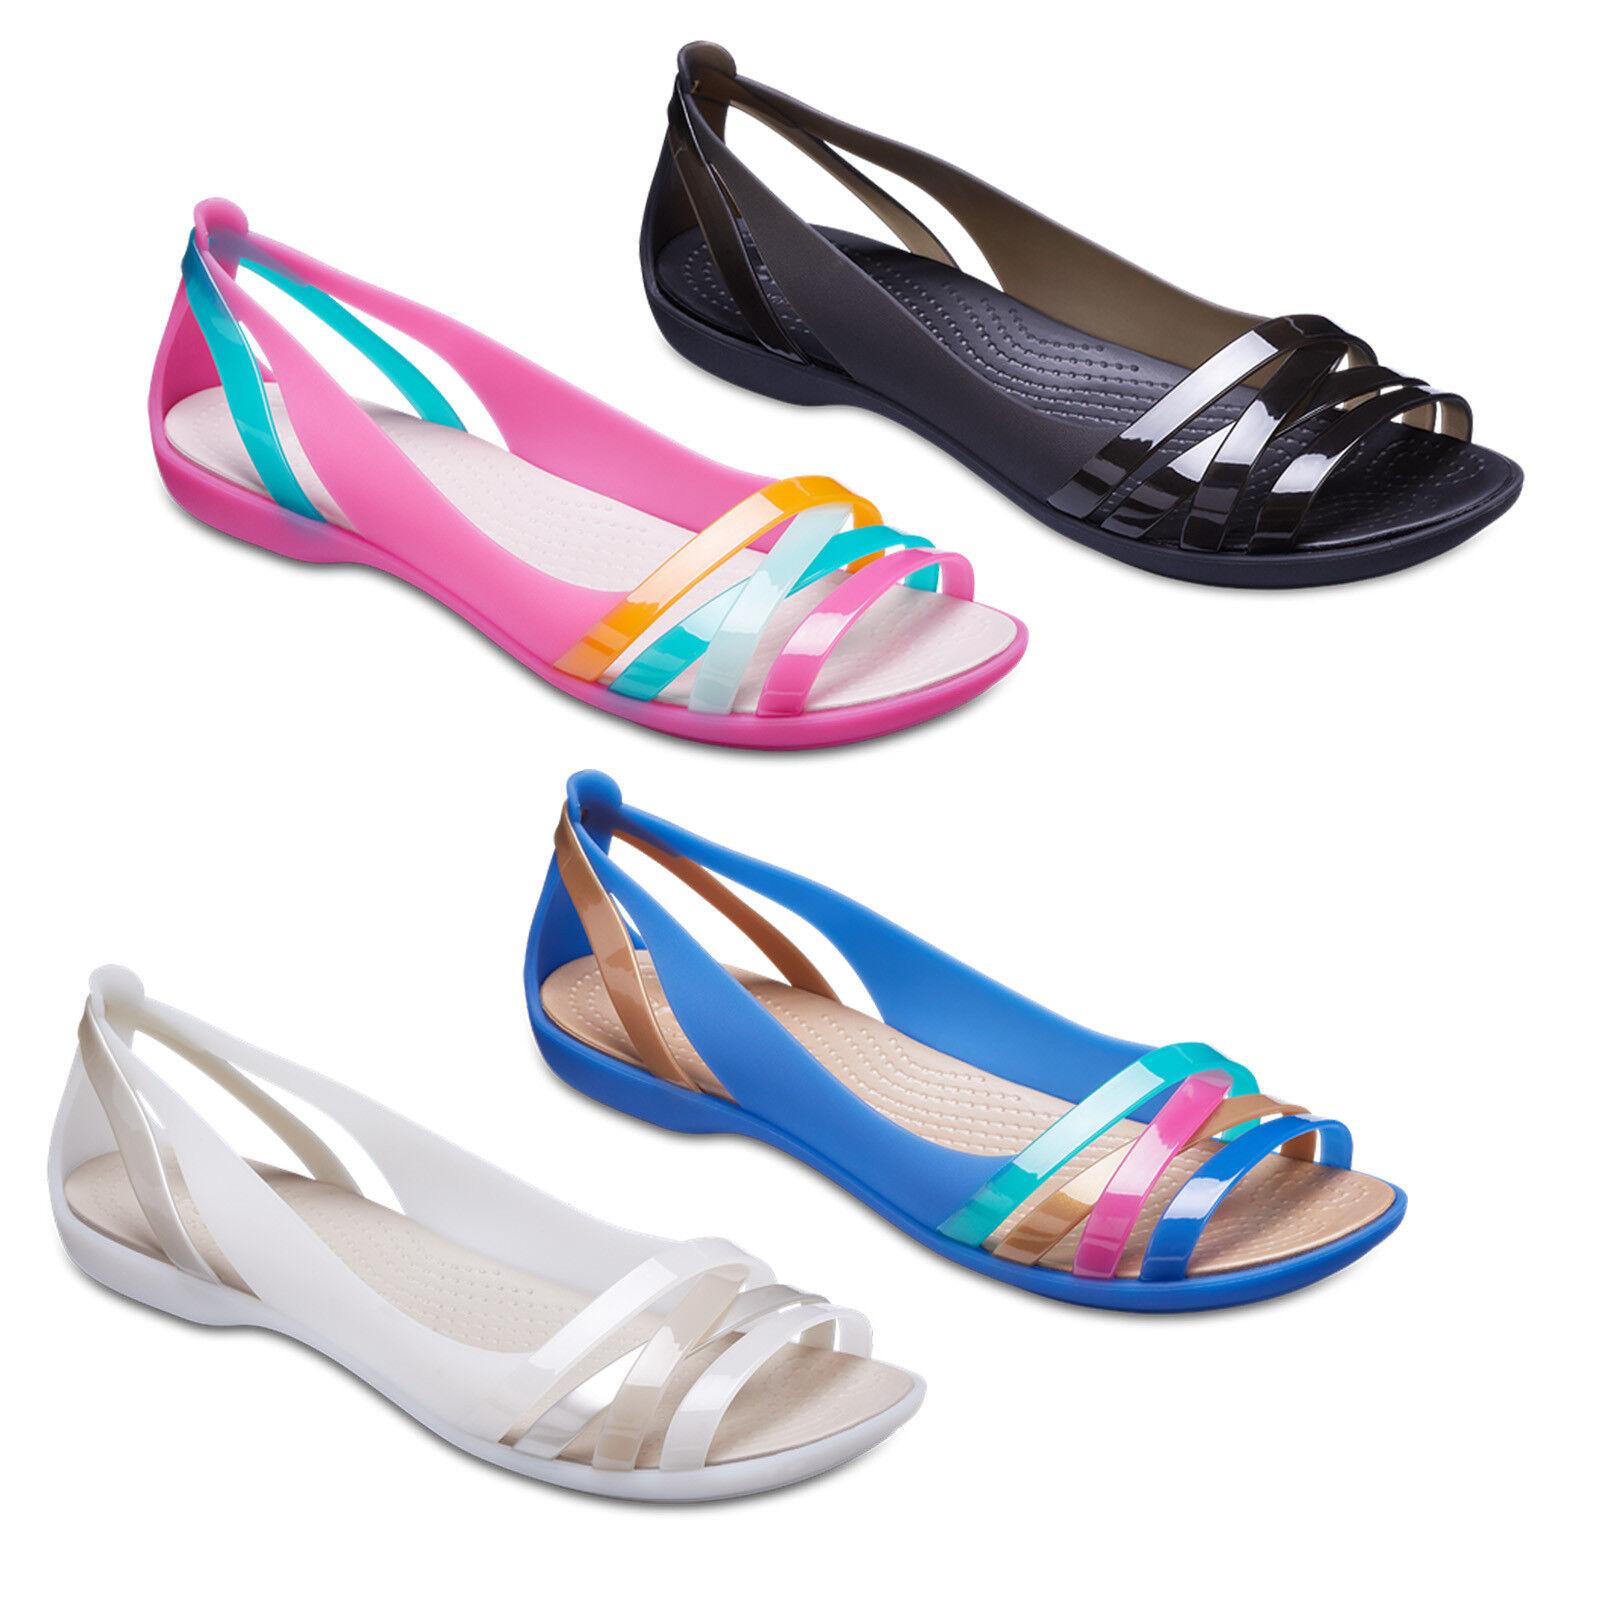 15a20e2a0cc2 Women s Crocs Isabella Huarache 2 Flat W Sandals in Black UK 7   EU ...